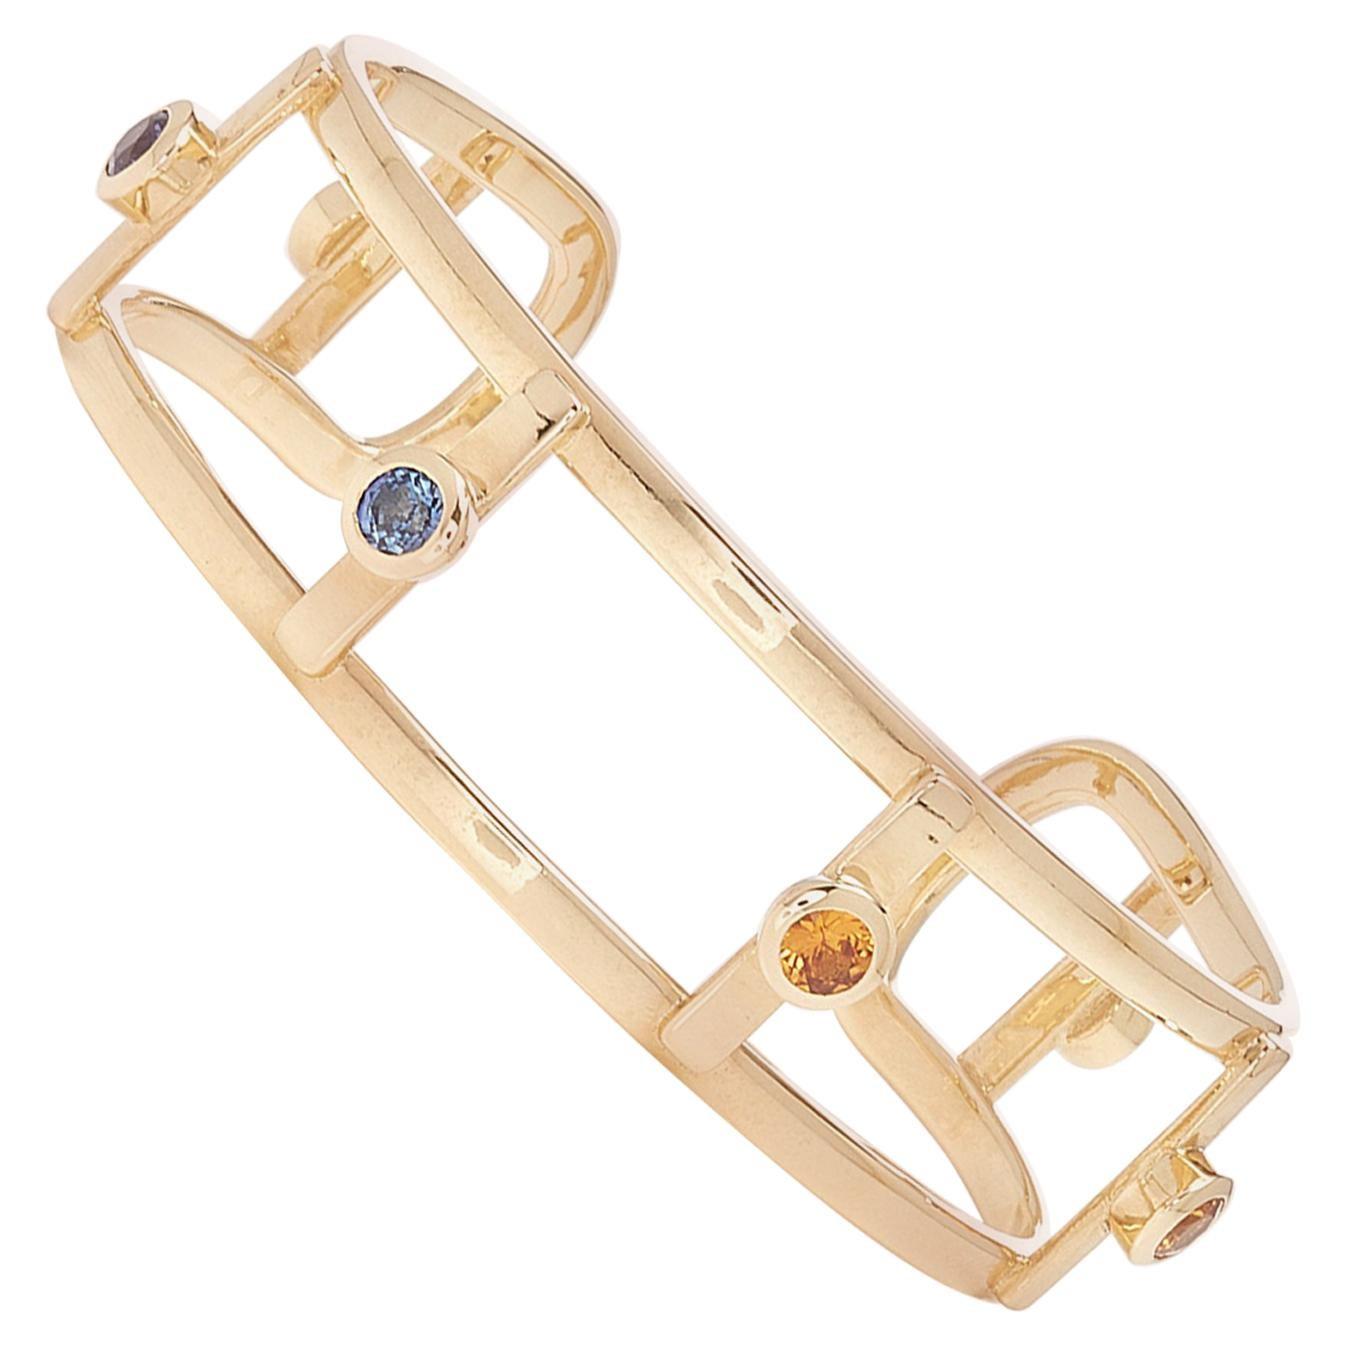 18 Karat Yellow Gold 6 Natural Sapphires Bangle Bracelet